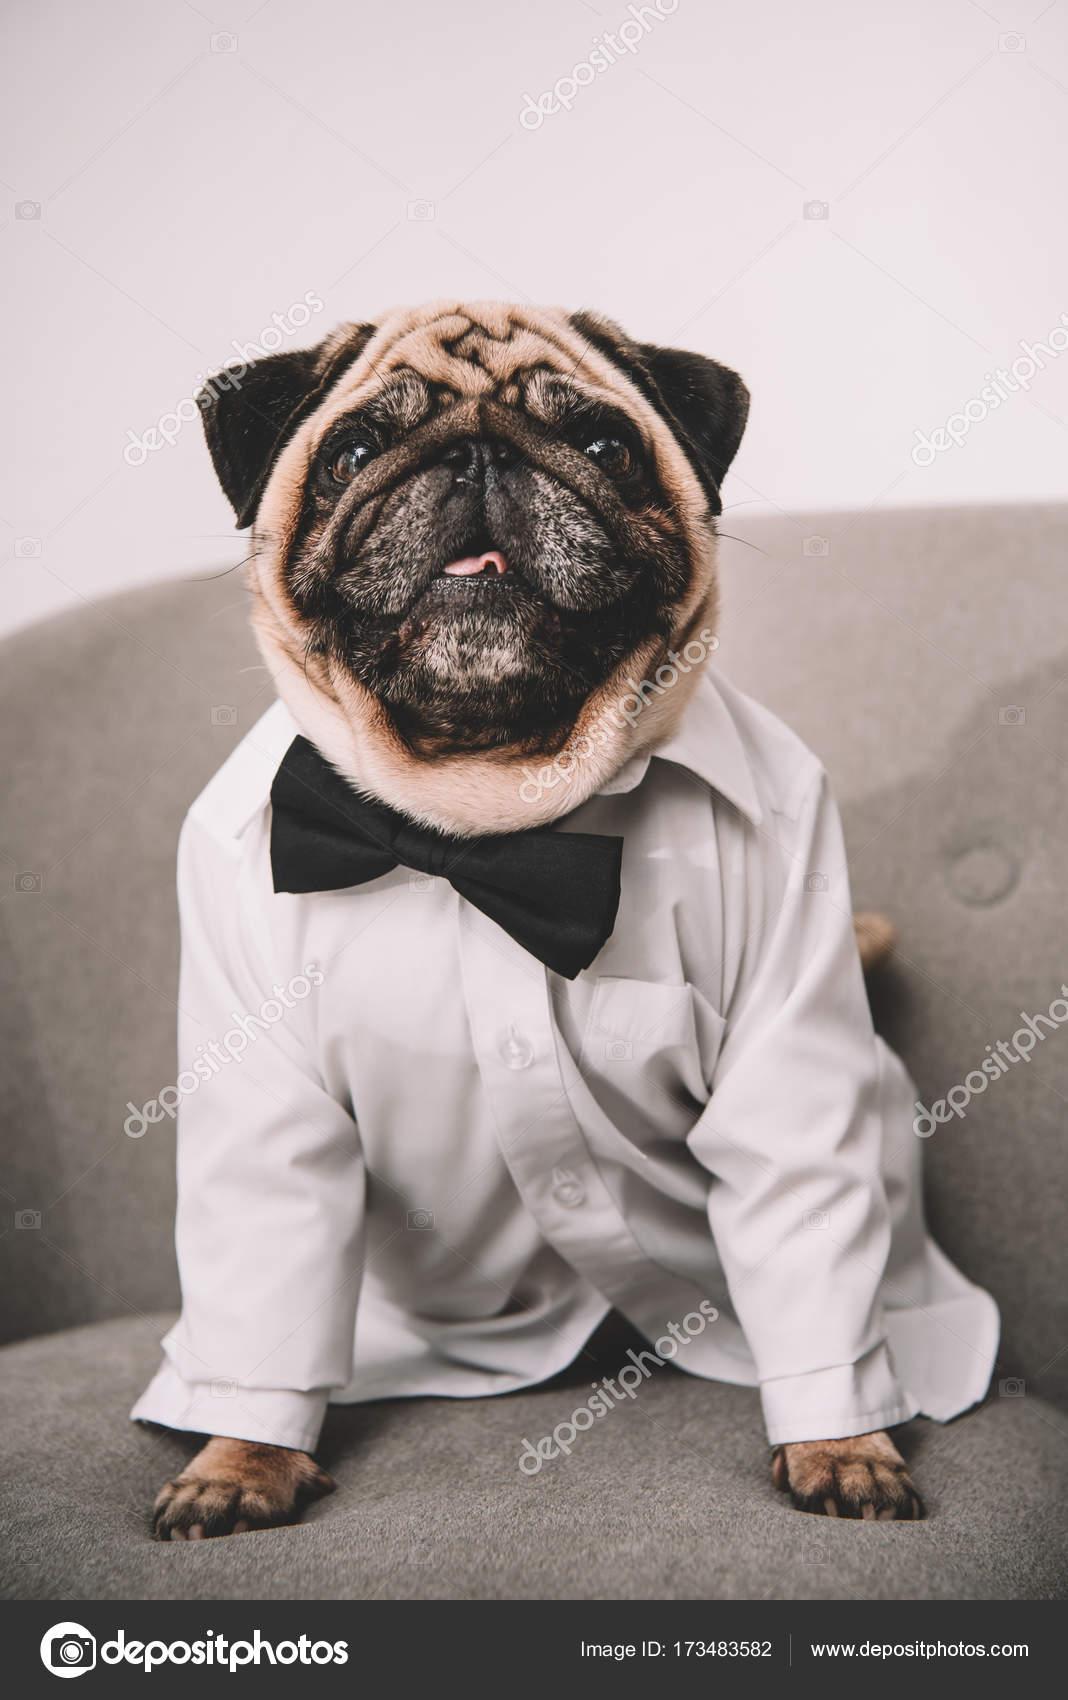 Popular Pug Bow Adorable Dog - depositphotos_173483582-stock-photo-stylish-pug  Perfect Image Reference_51856  .jpg